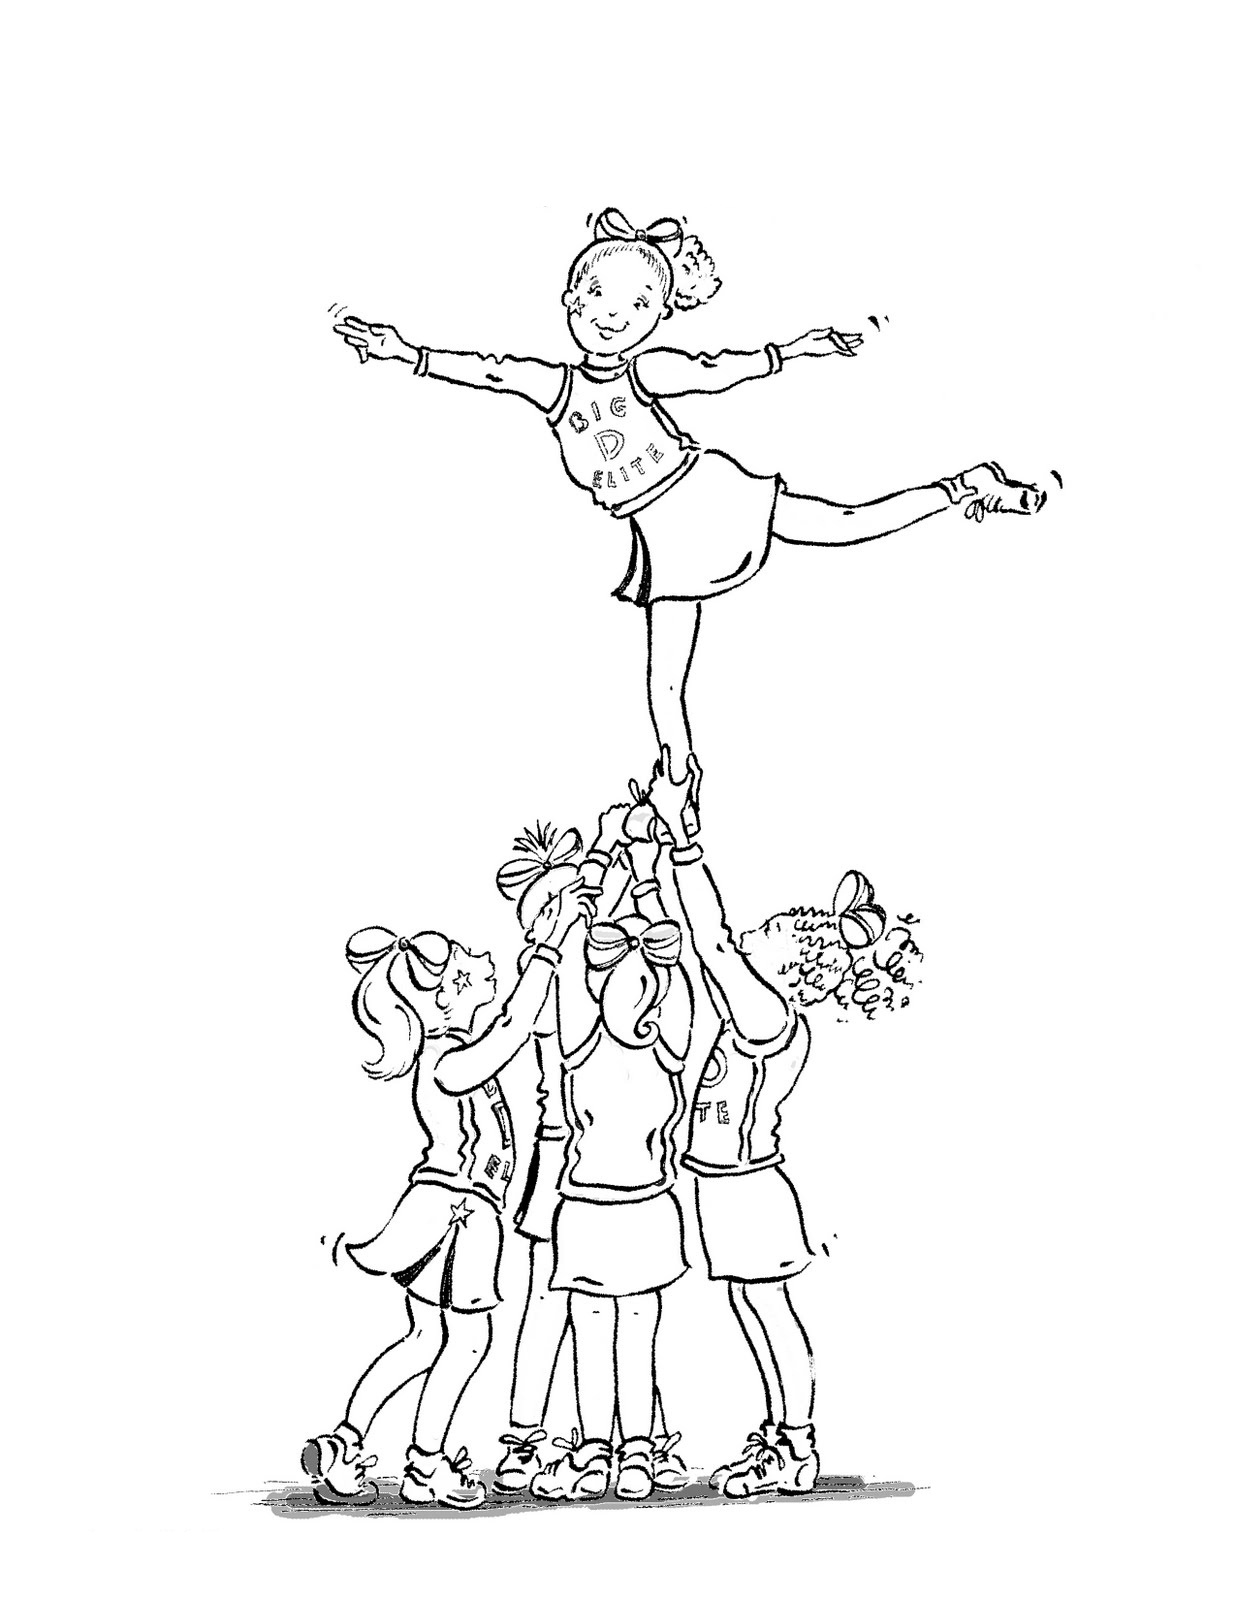 1236x1600 Portfolio Cheerleading Megaphone Coloring Pages Cheerleader Free